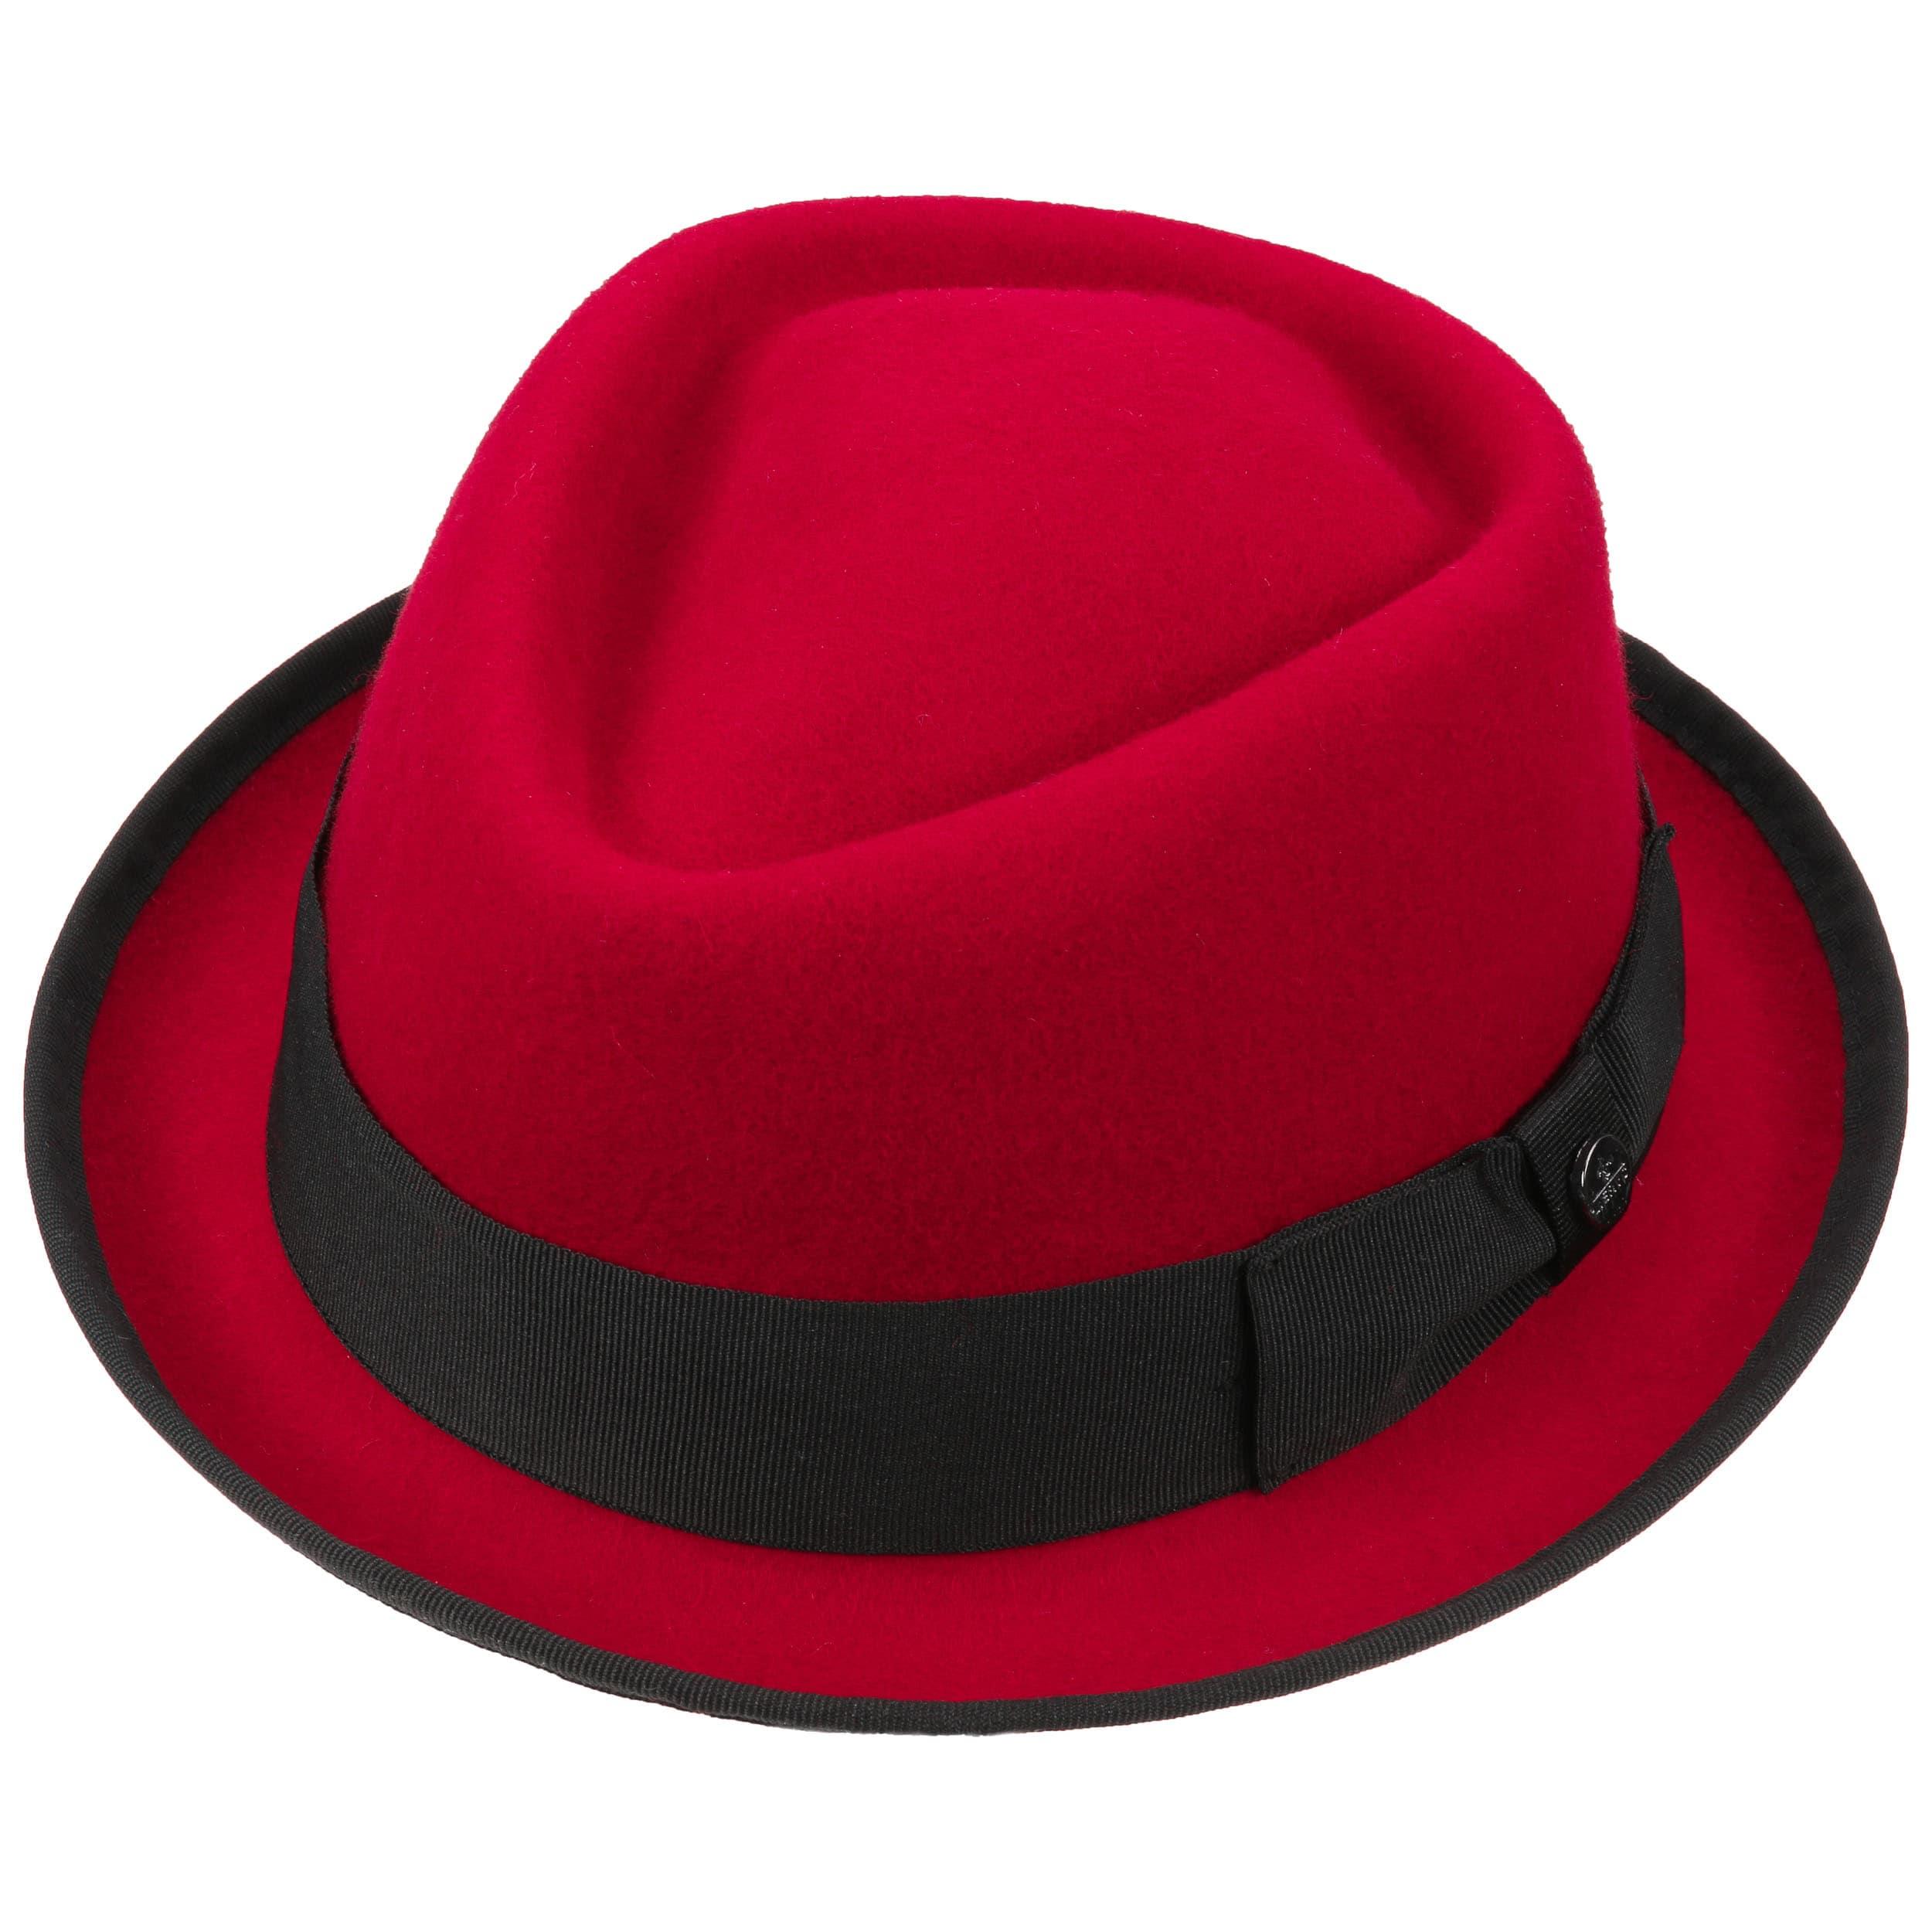 76dcf79b8fde6 ... Fedora Pork Pie Hat by Lierys - red 1 ...